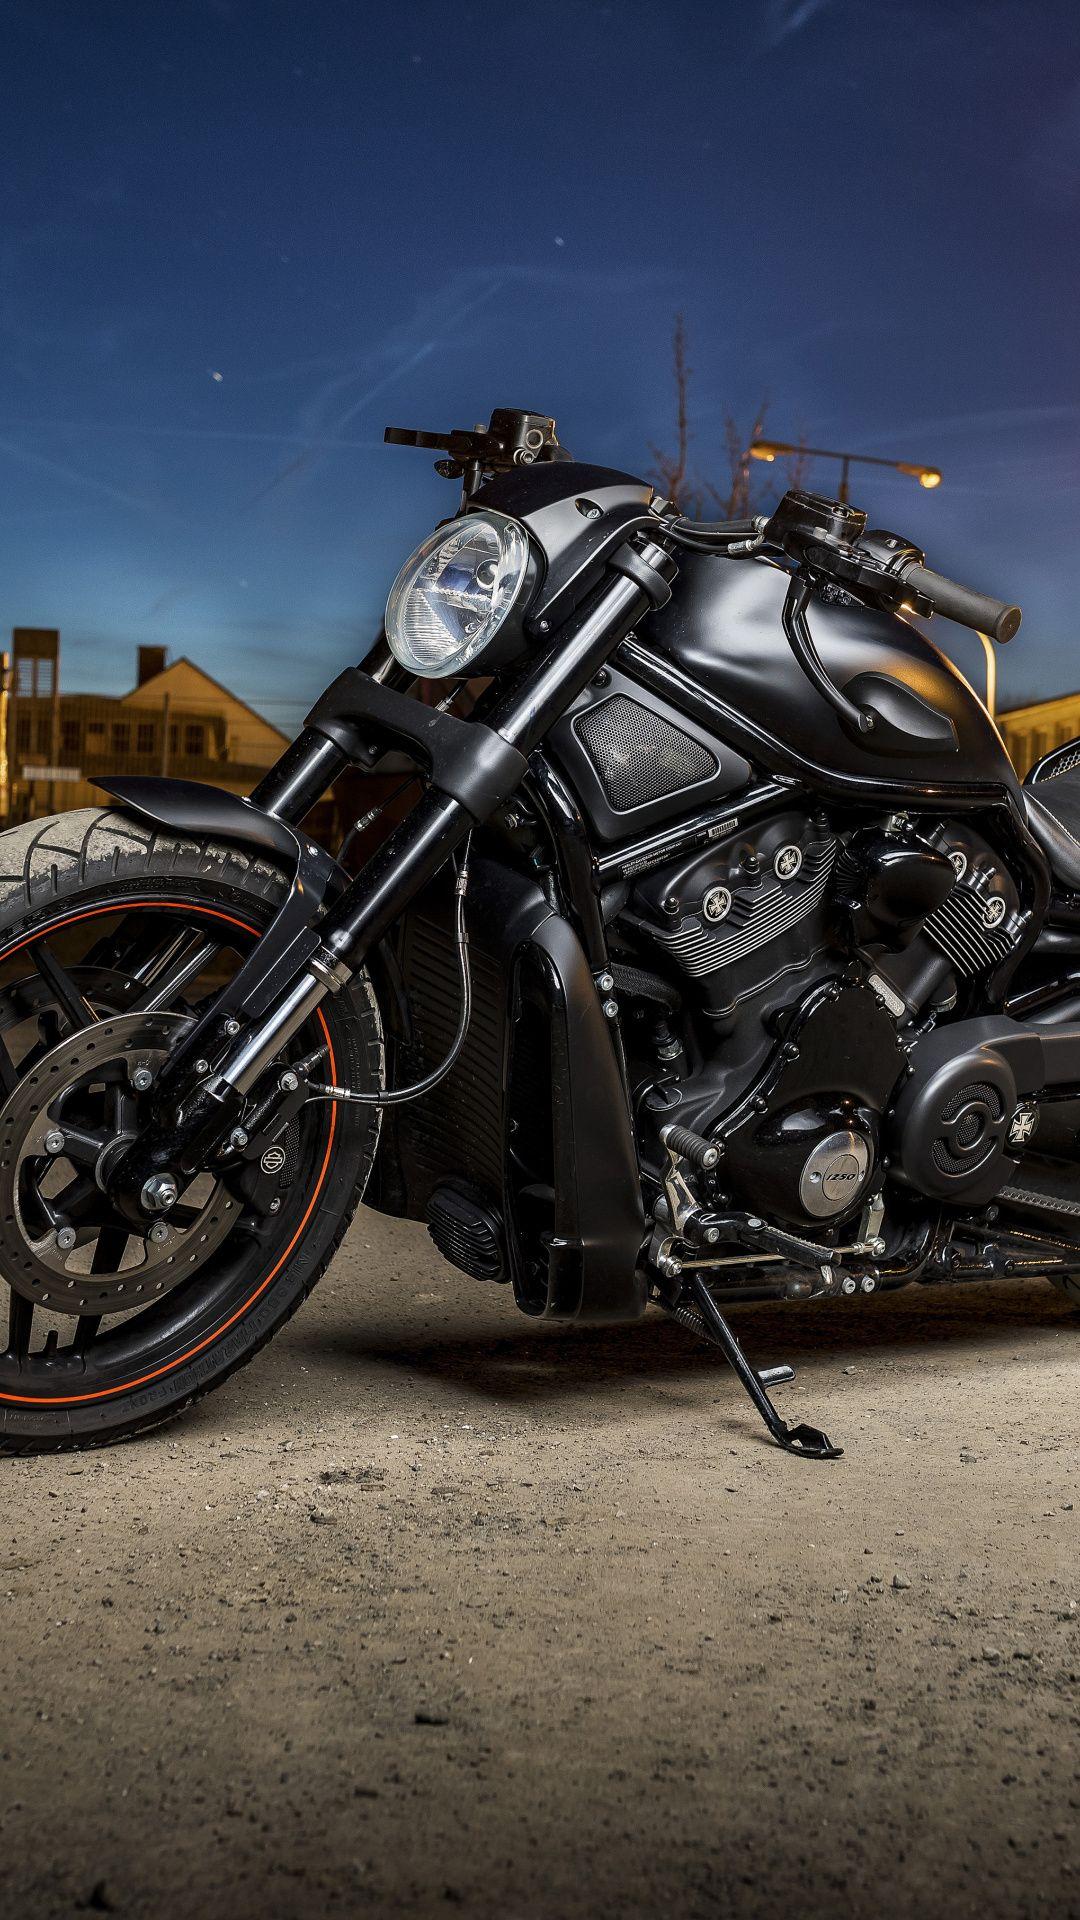 Harley Davidson Wallpaper Hd In 2020 Harley Davidson Wallpaper Harley Davidson Harley Davidson Dark Custom